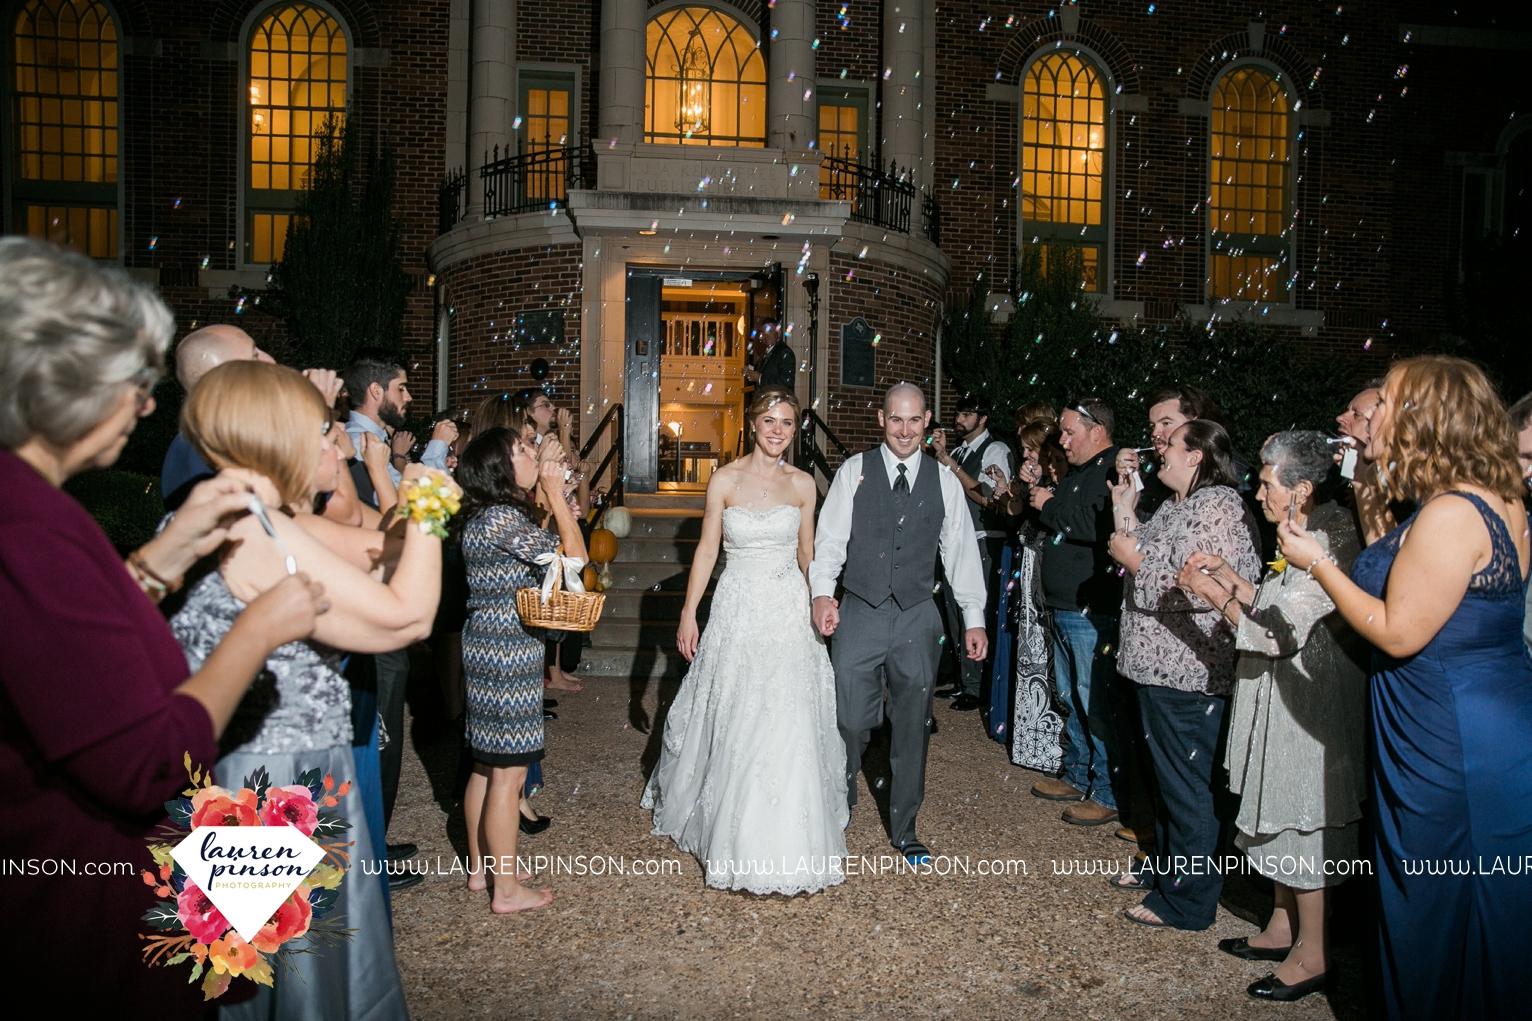 kemp-center-for-the-arts-wichita-falls-texas-wedding-photographer-fall-wedding-pumpkins-198.jpg